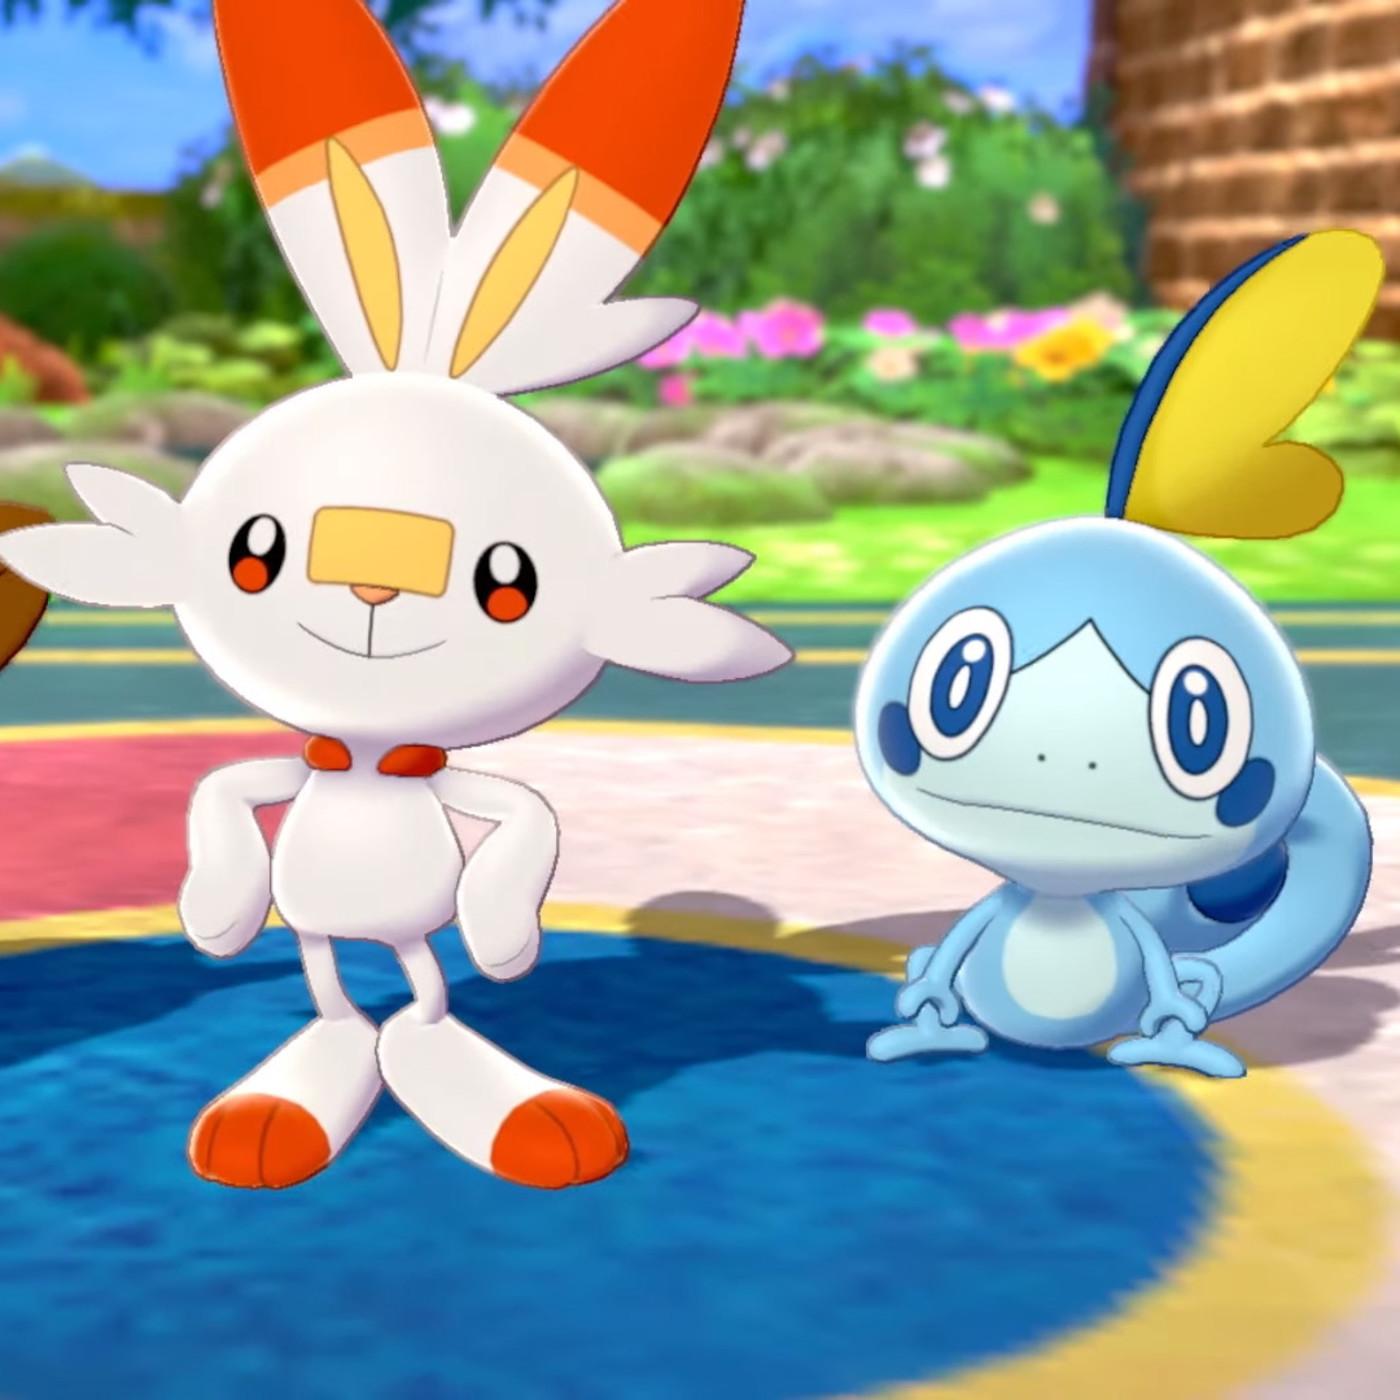 Rtfm 2x20 : Pokémon espada y escudo